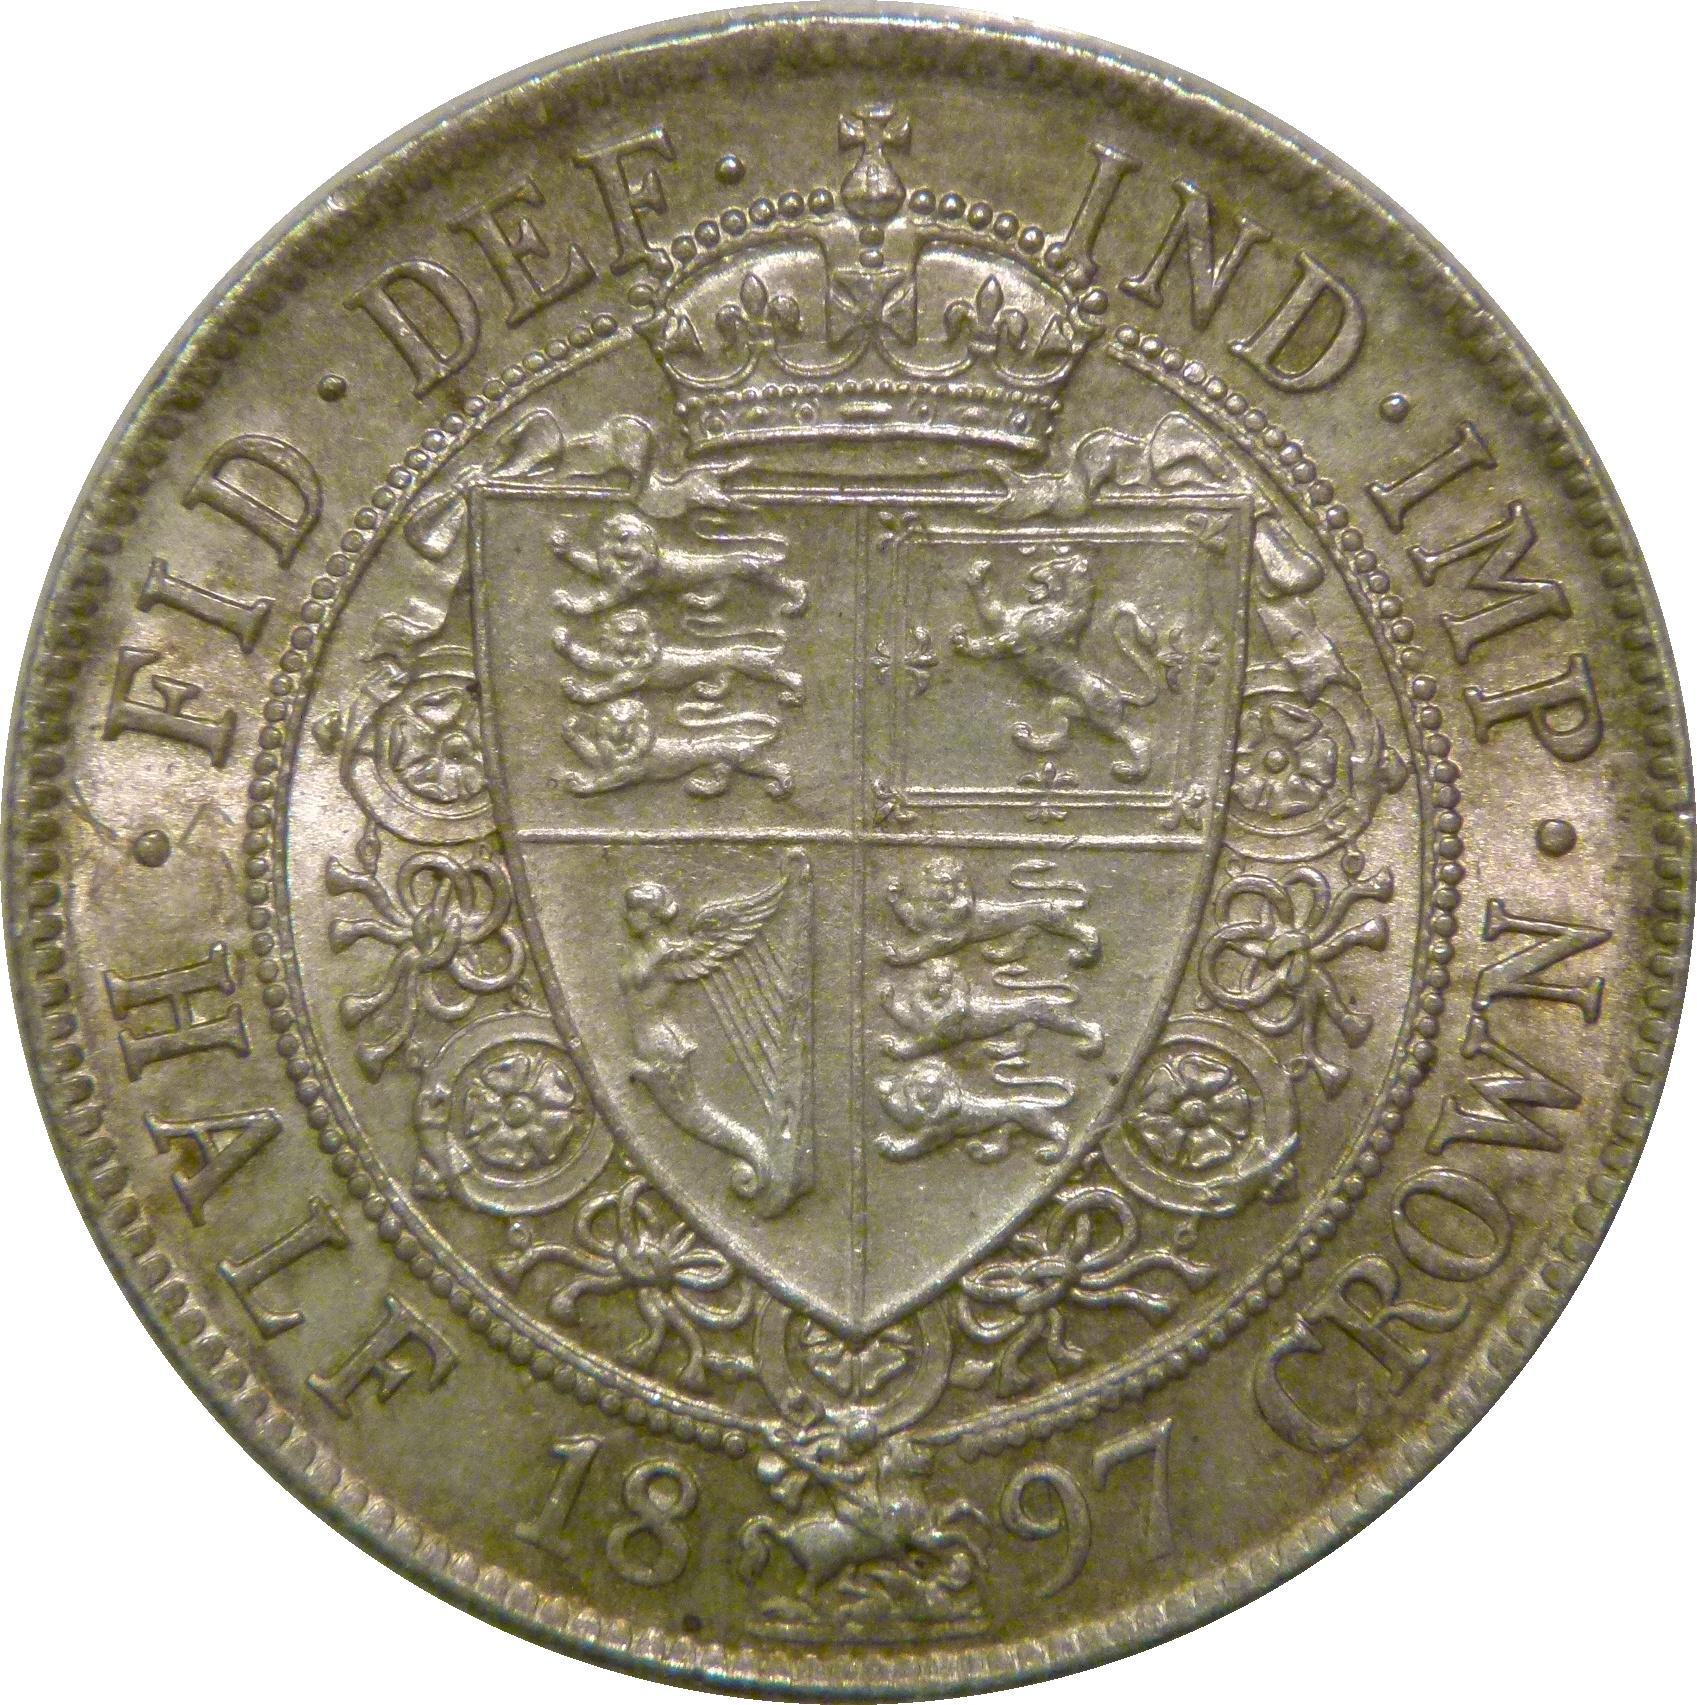 1897 Halfcrown, CGS 78(MS 63-64), UNC, Victoria, UIN 34113